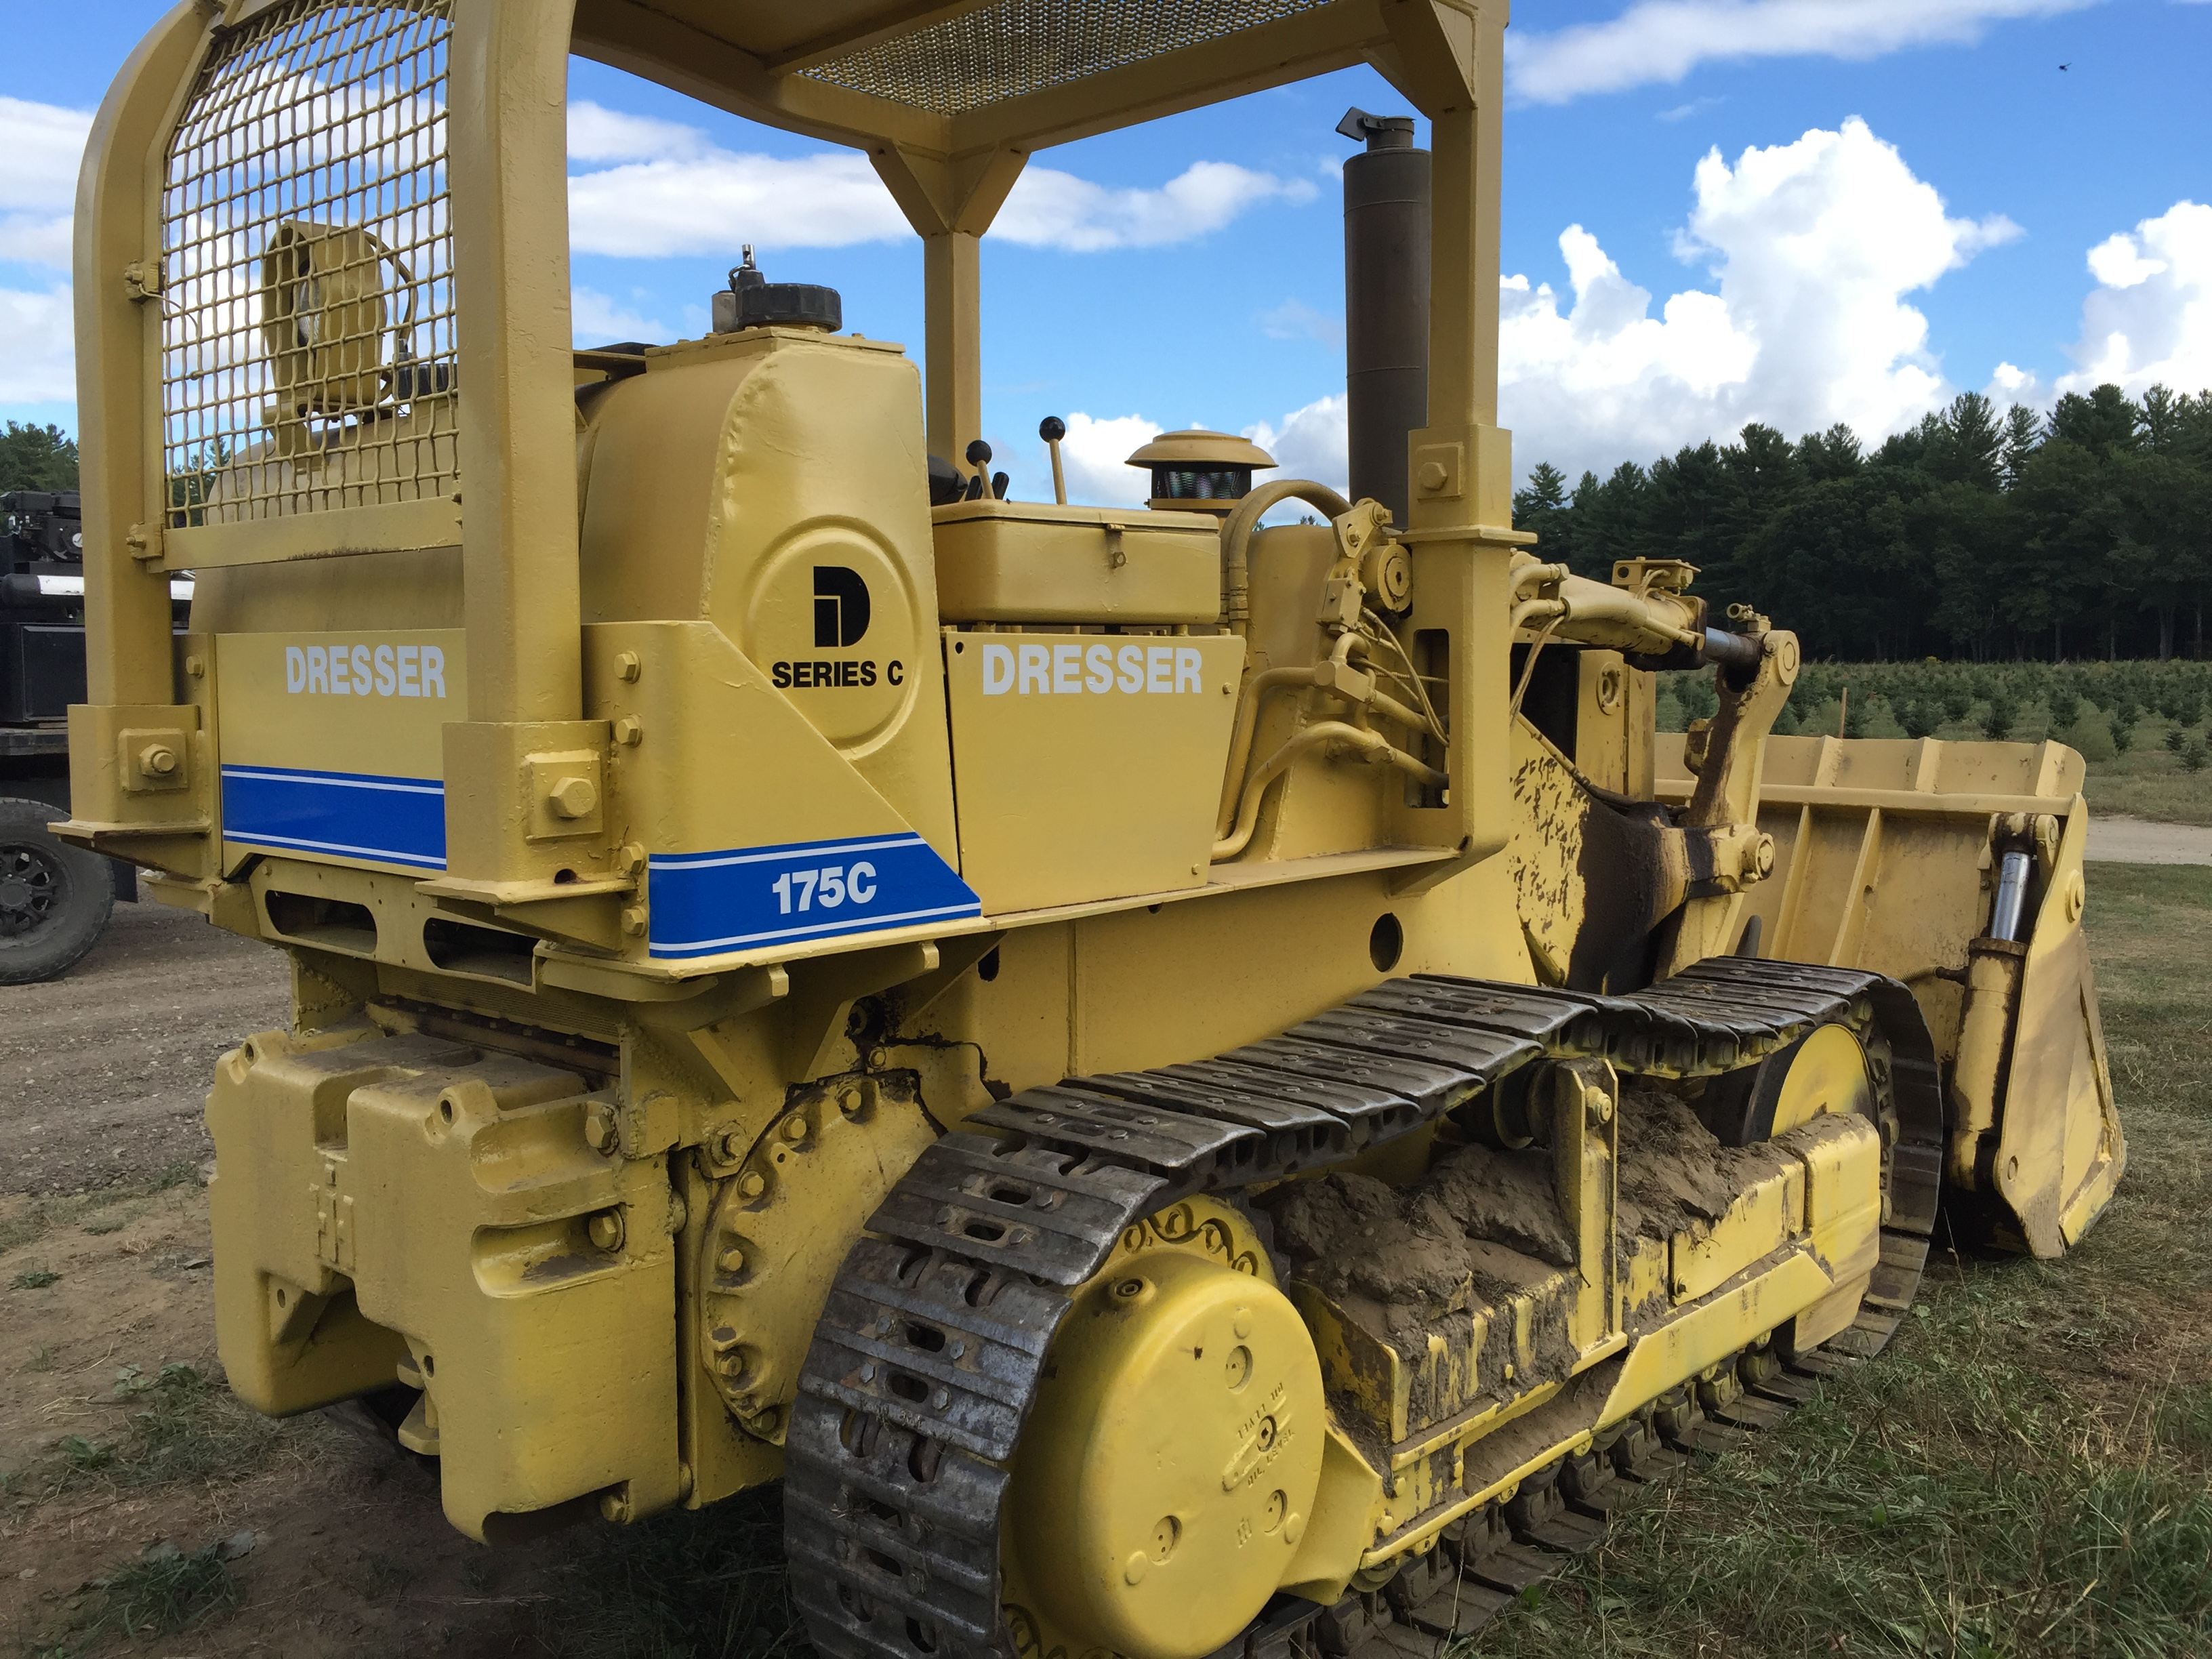 Dresser 175C transmission help please - IH Construction